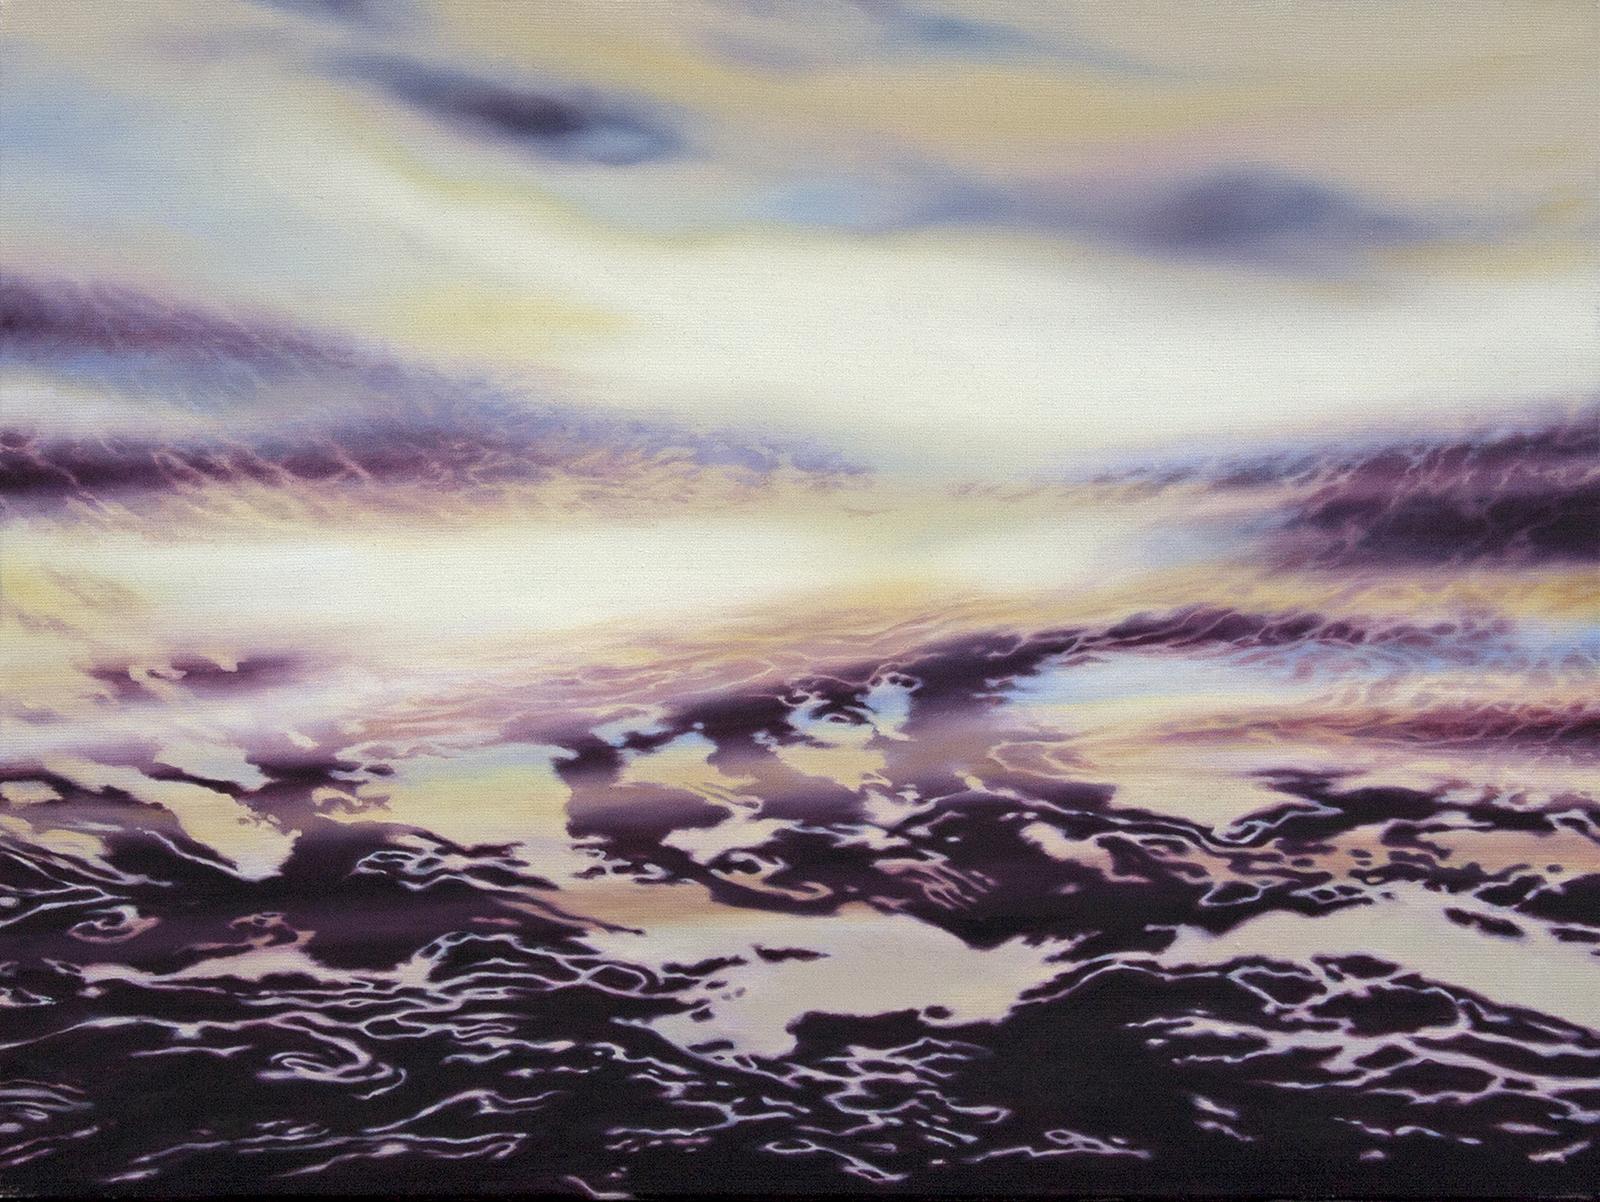 Nebeltreiben 2013, 60 x 80 cm, Öl auf Leinwand  Floating Fog, oil on canvas